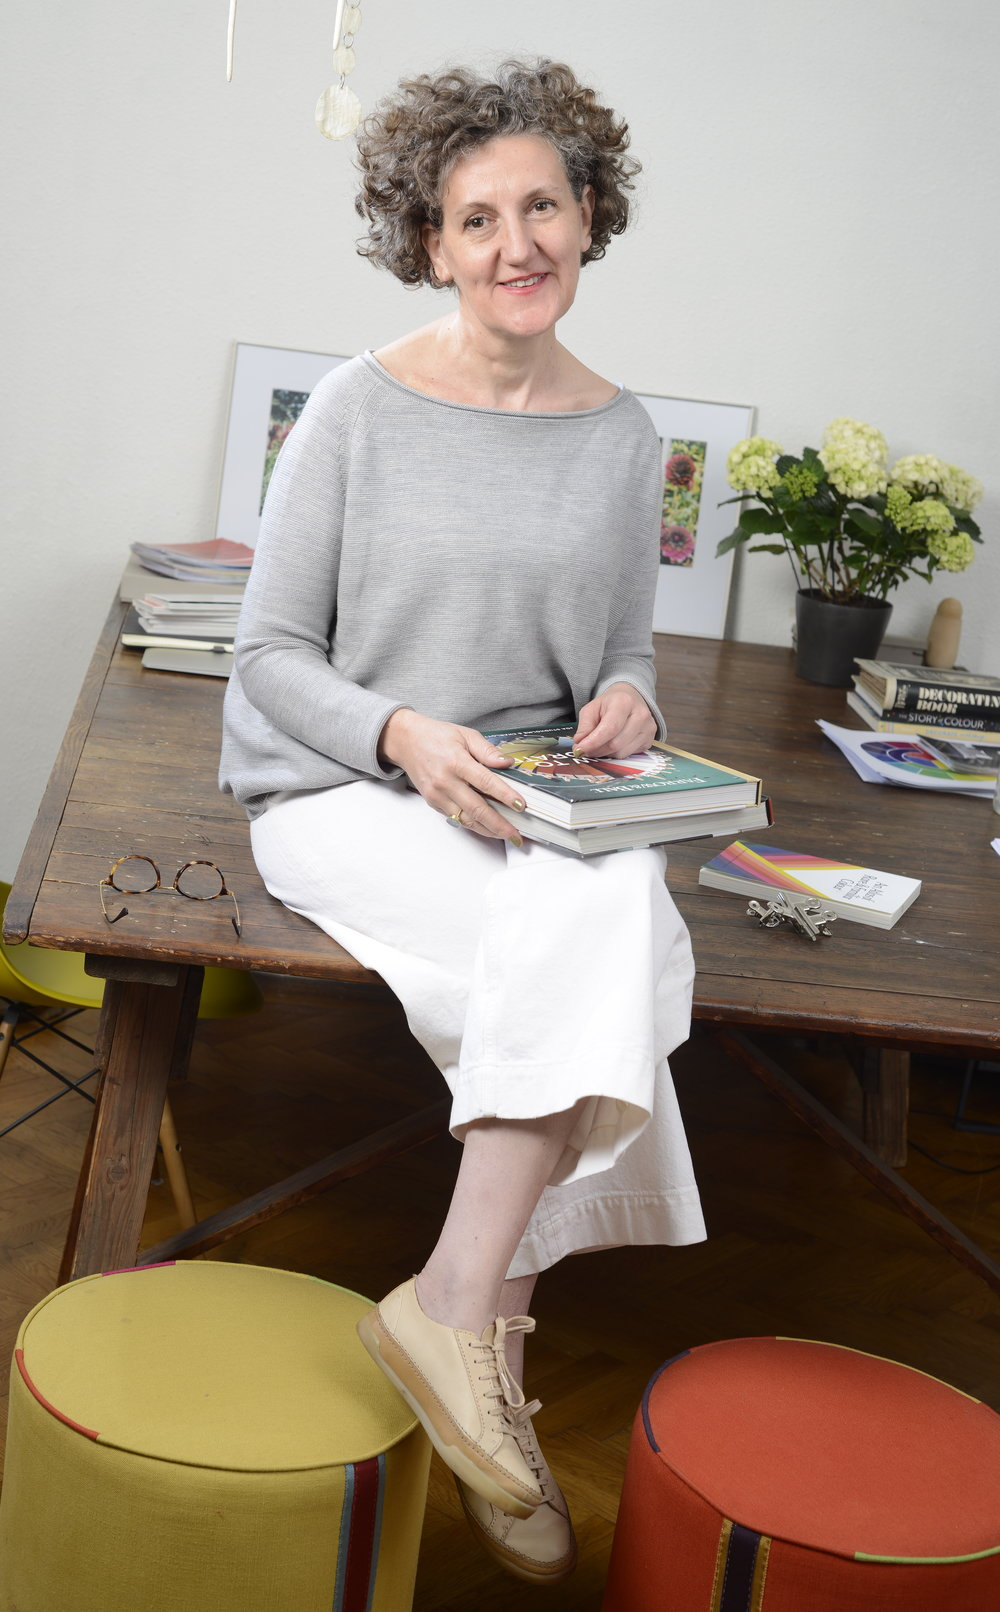 Martine Claessens